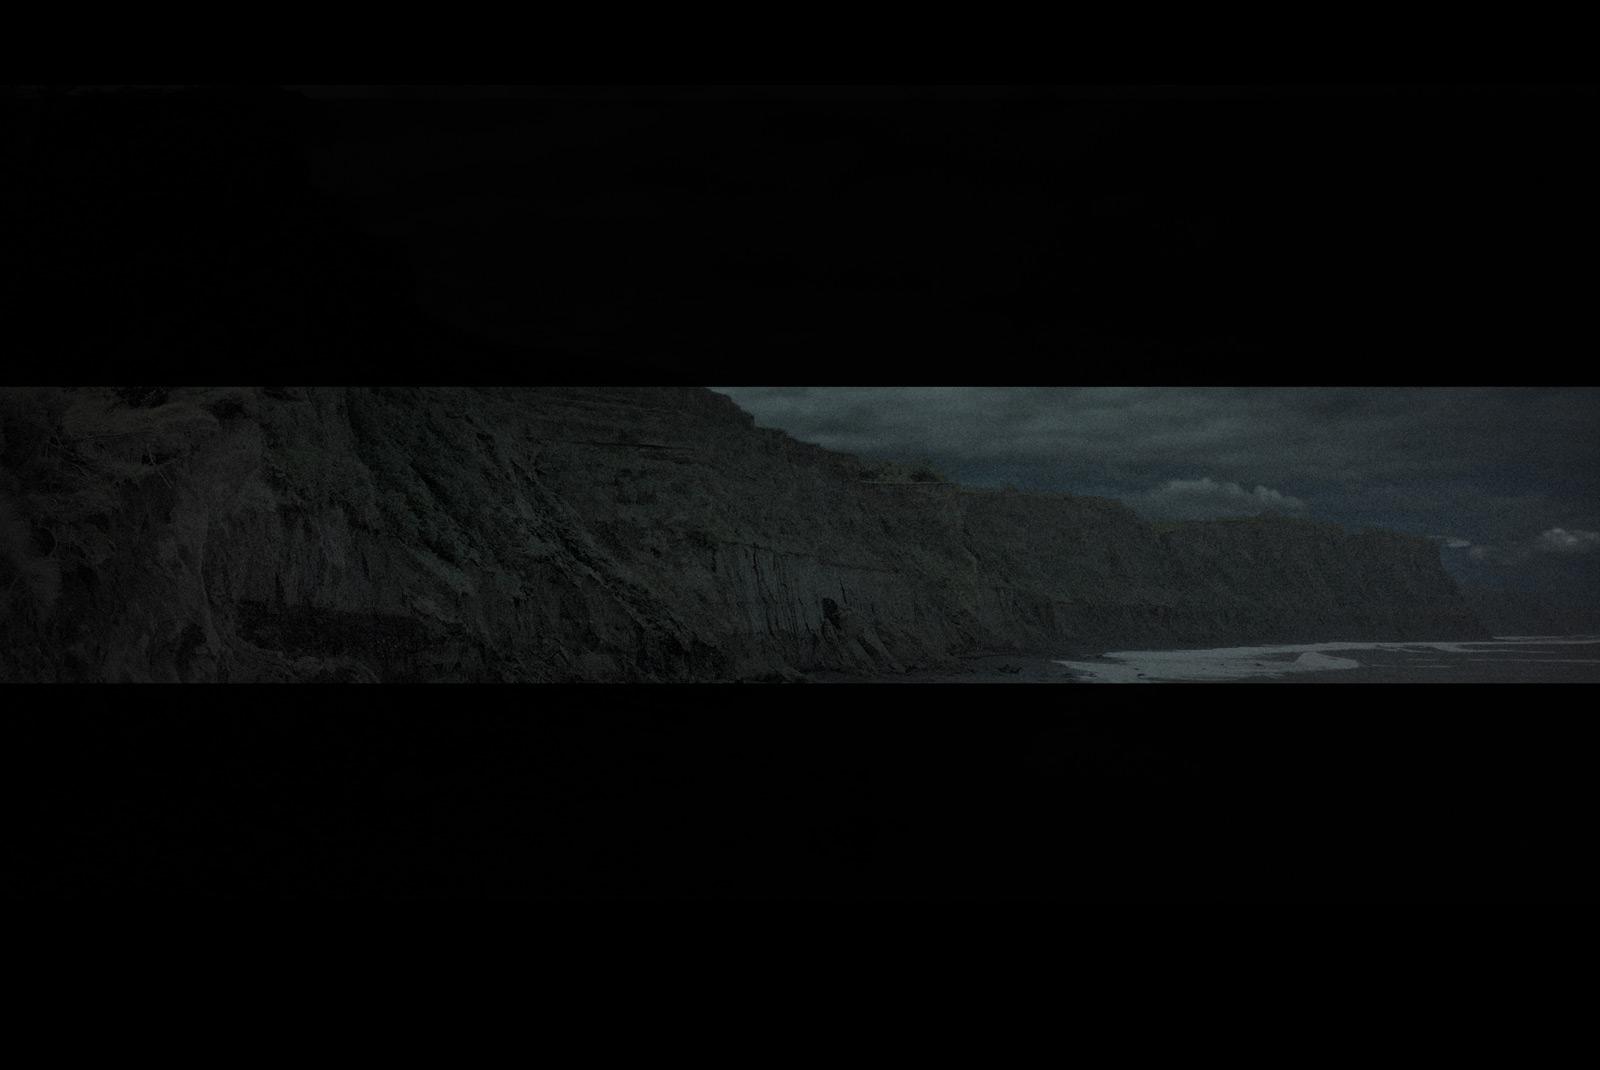 Ohawe (Tai Moana Tai Tangata), video animation by New Zealand artist Brett Graham